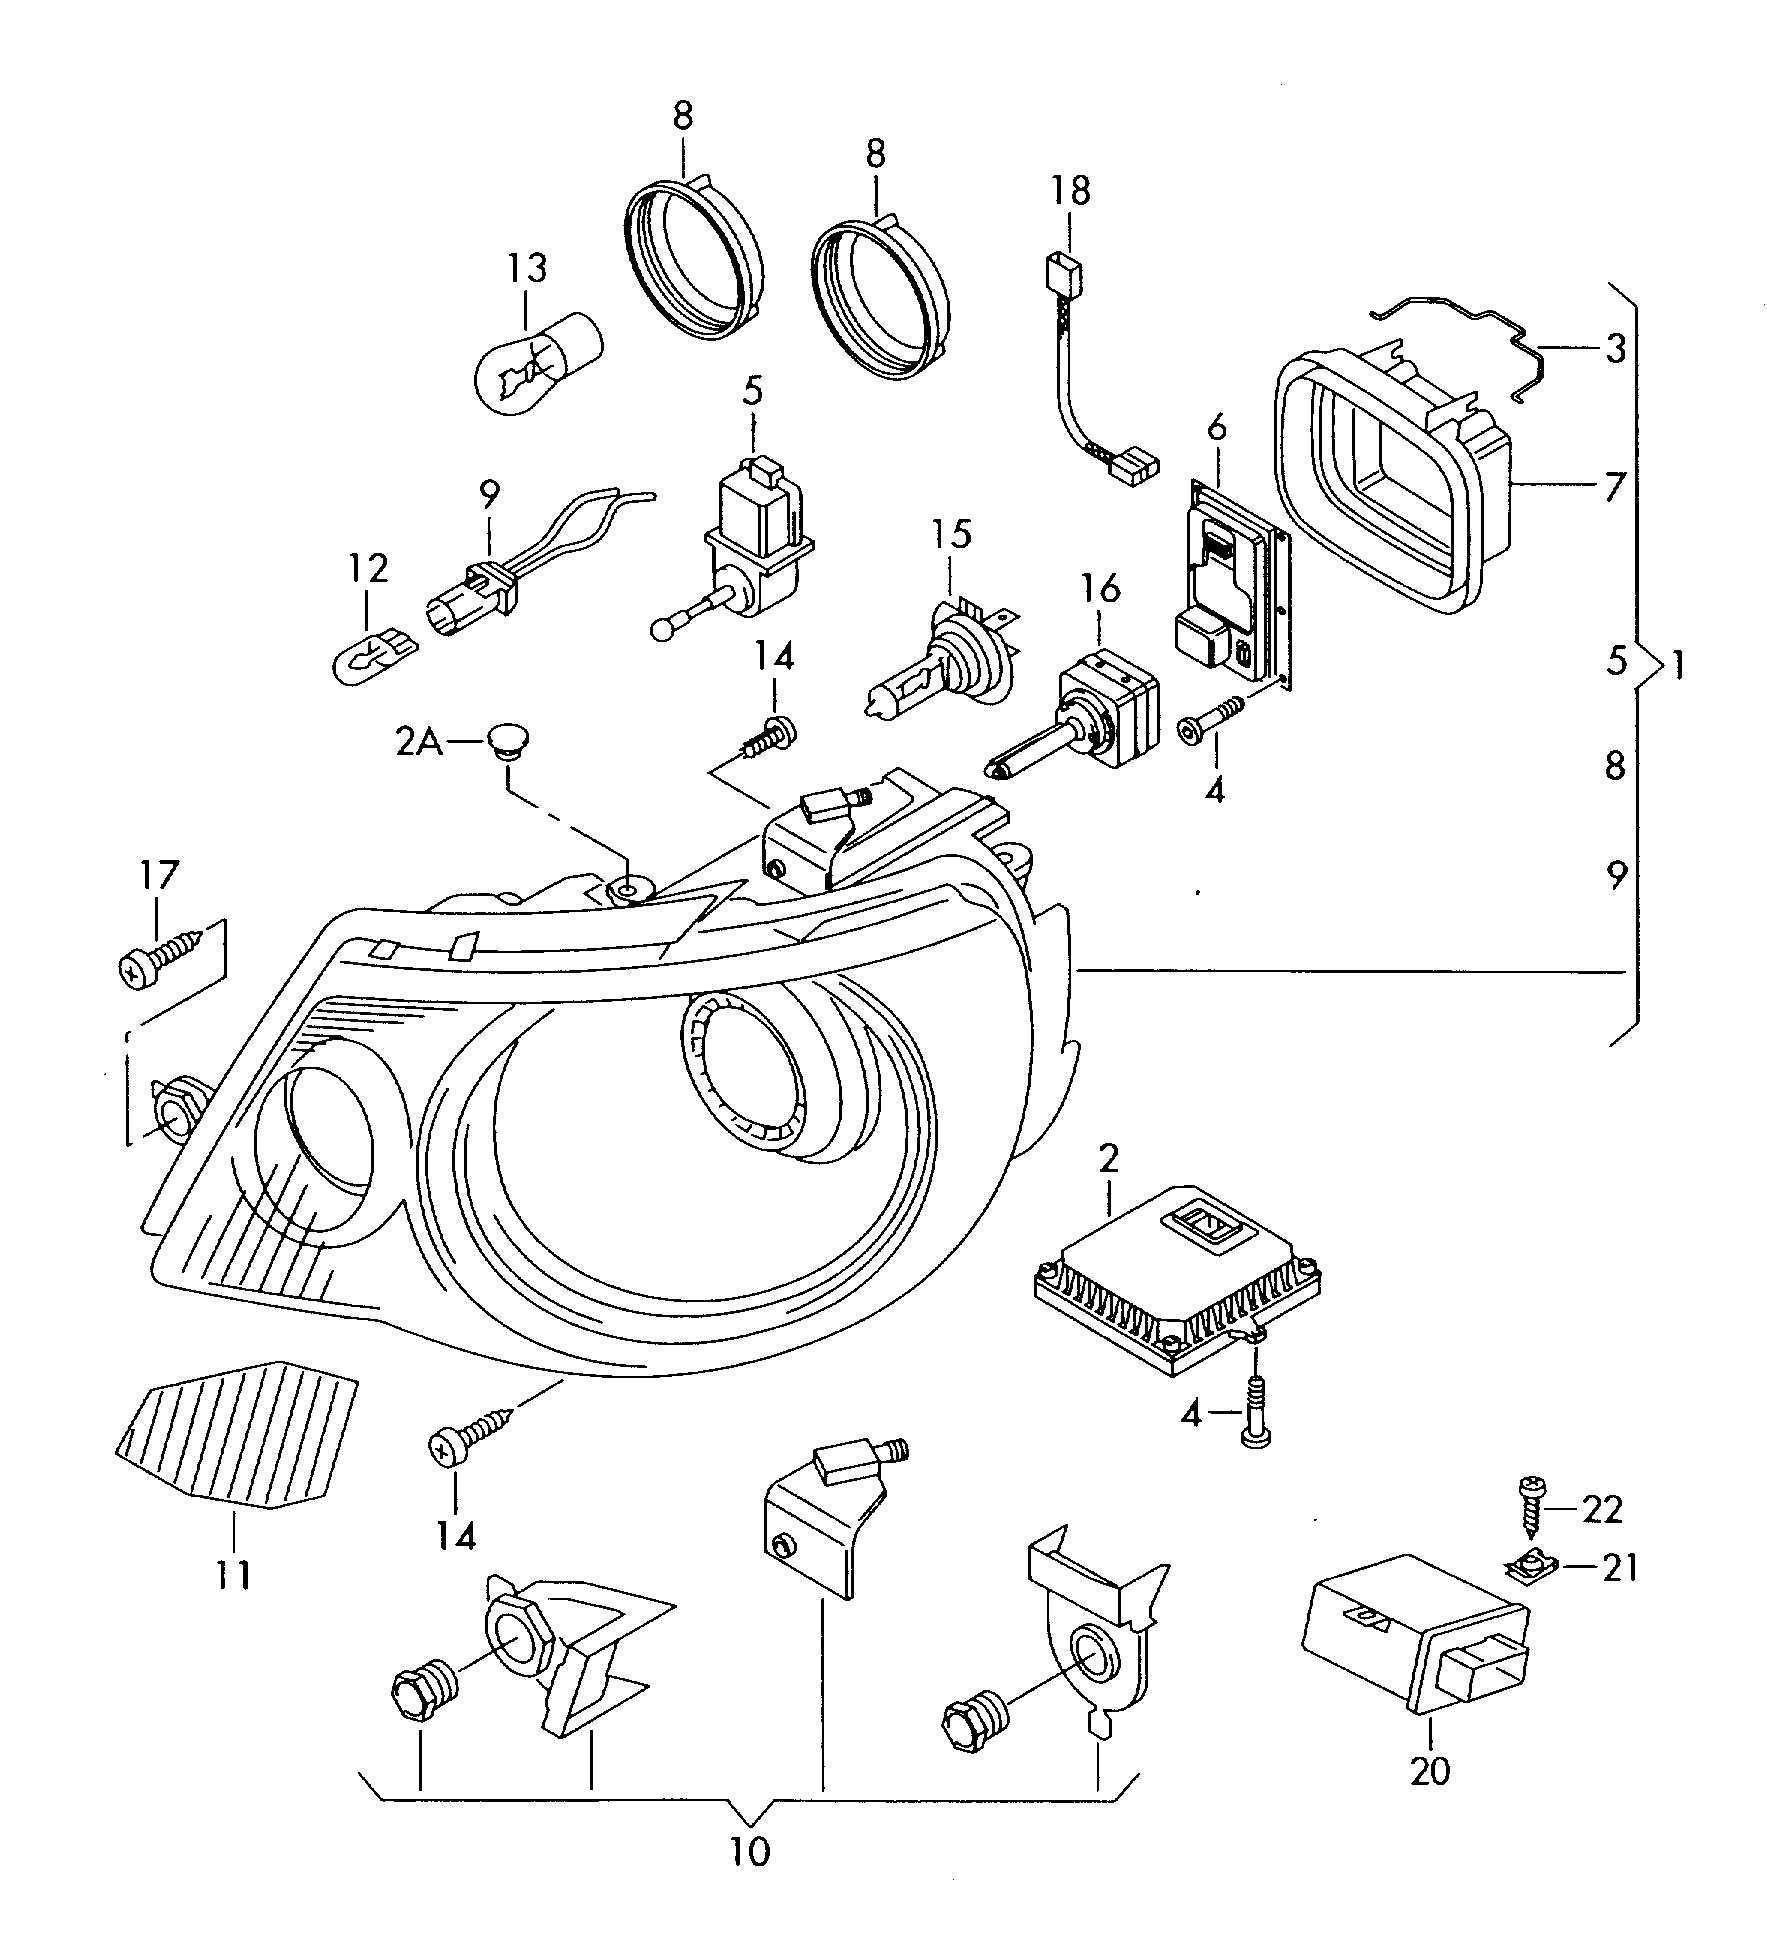 Volkswagen Eos Ballast For Gas Discharge Lamp Control